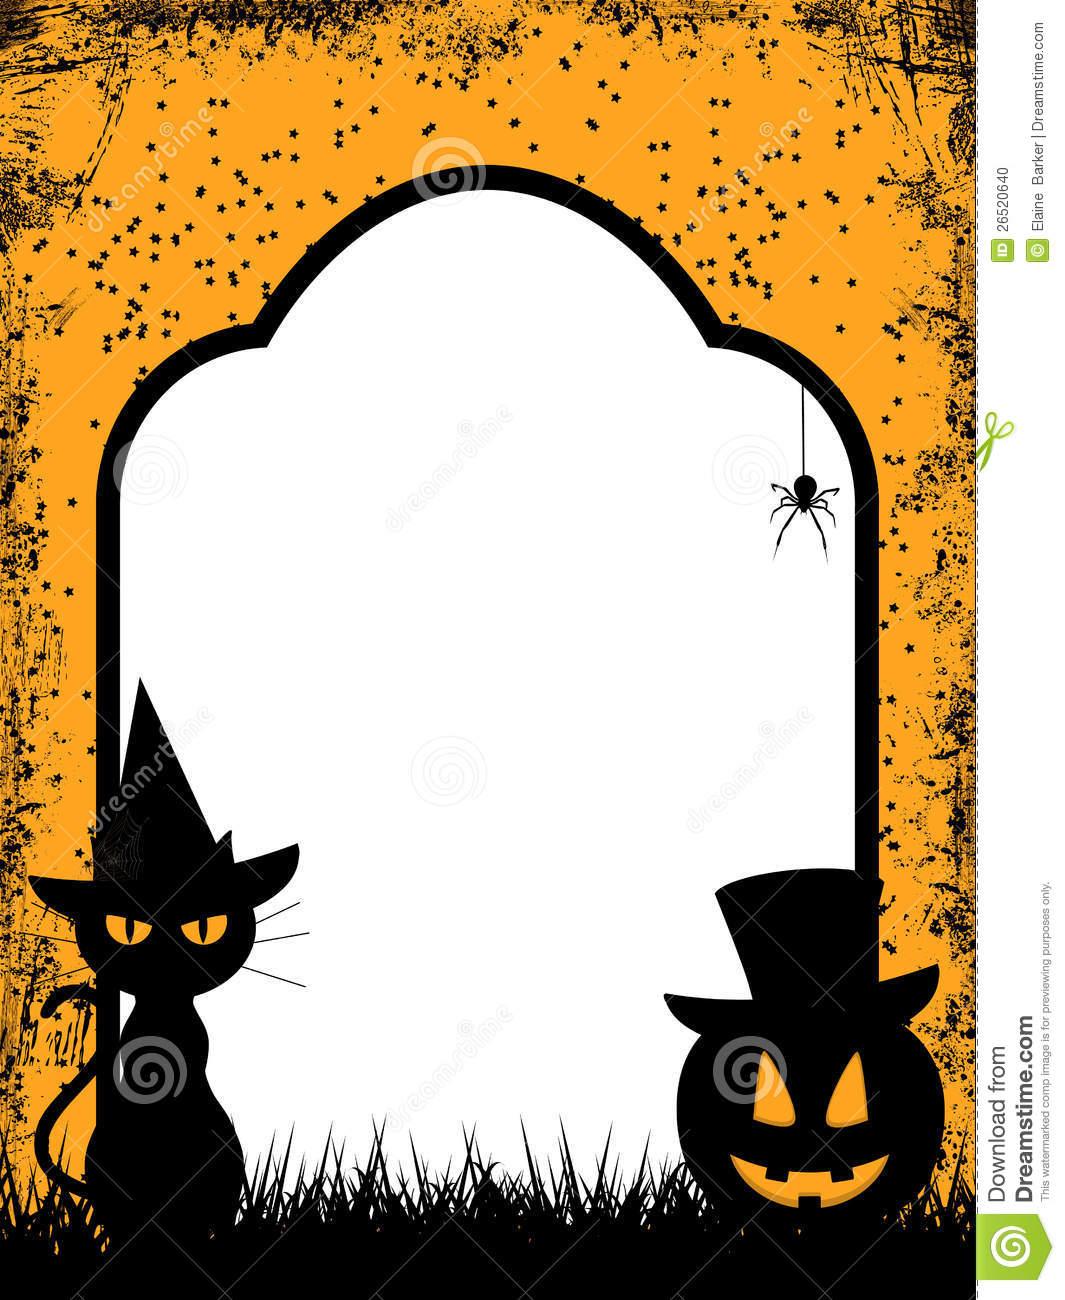 Border Clipart Halloween Bord - Halloween Border Clip Art